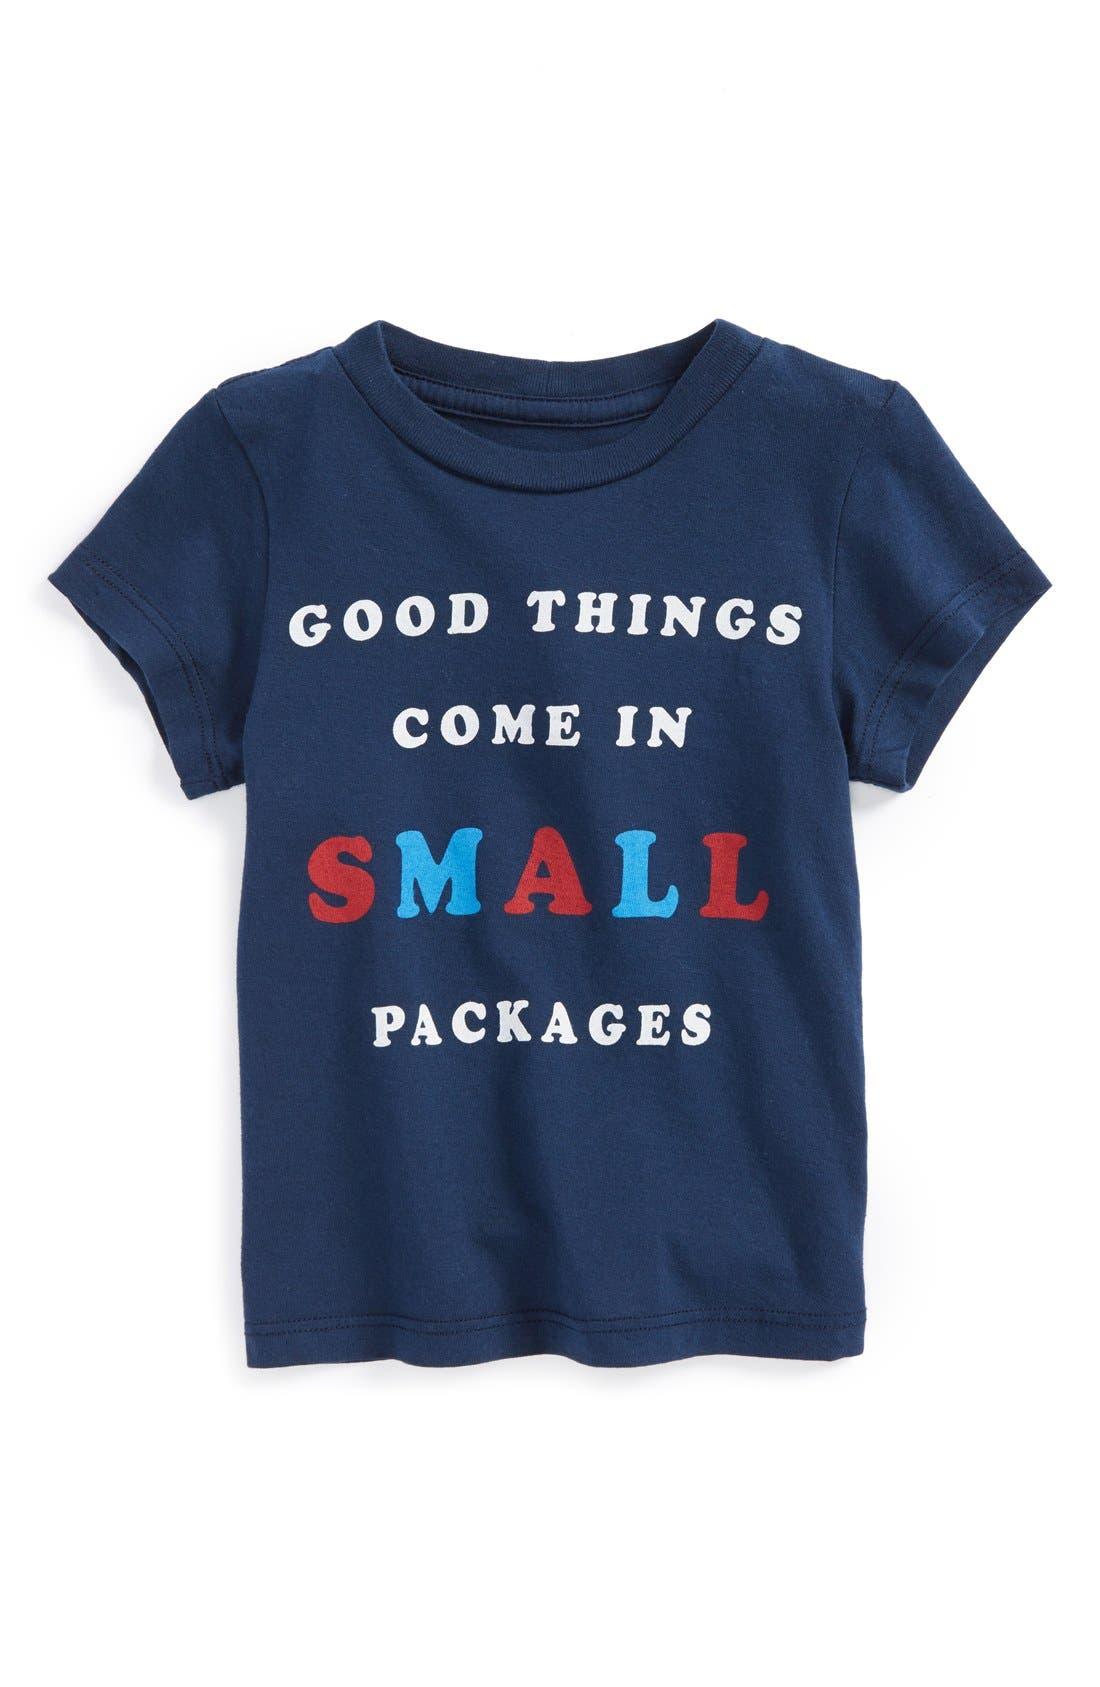 Alternate Image 1 Selected - Peek 'Good Things' Cotton T-Shirt (Baby)